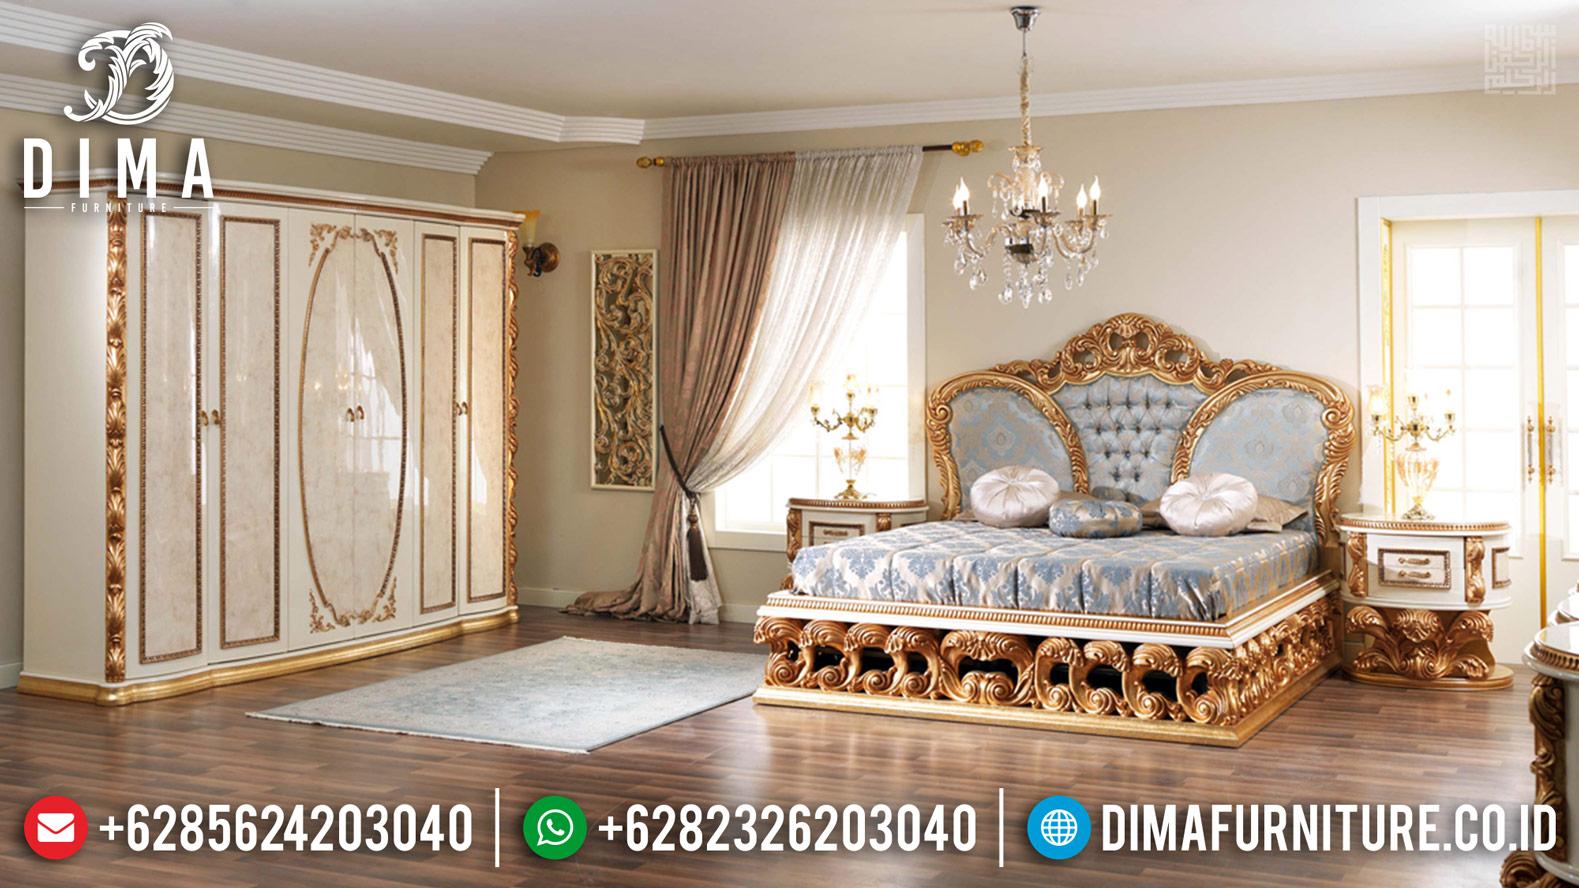 Superior Luxury Tempat Tidur Jepara Mewah Golden Diamond Glossy TTJ-0434